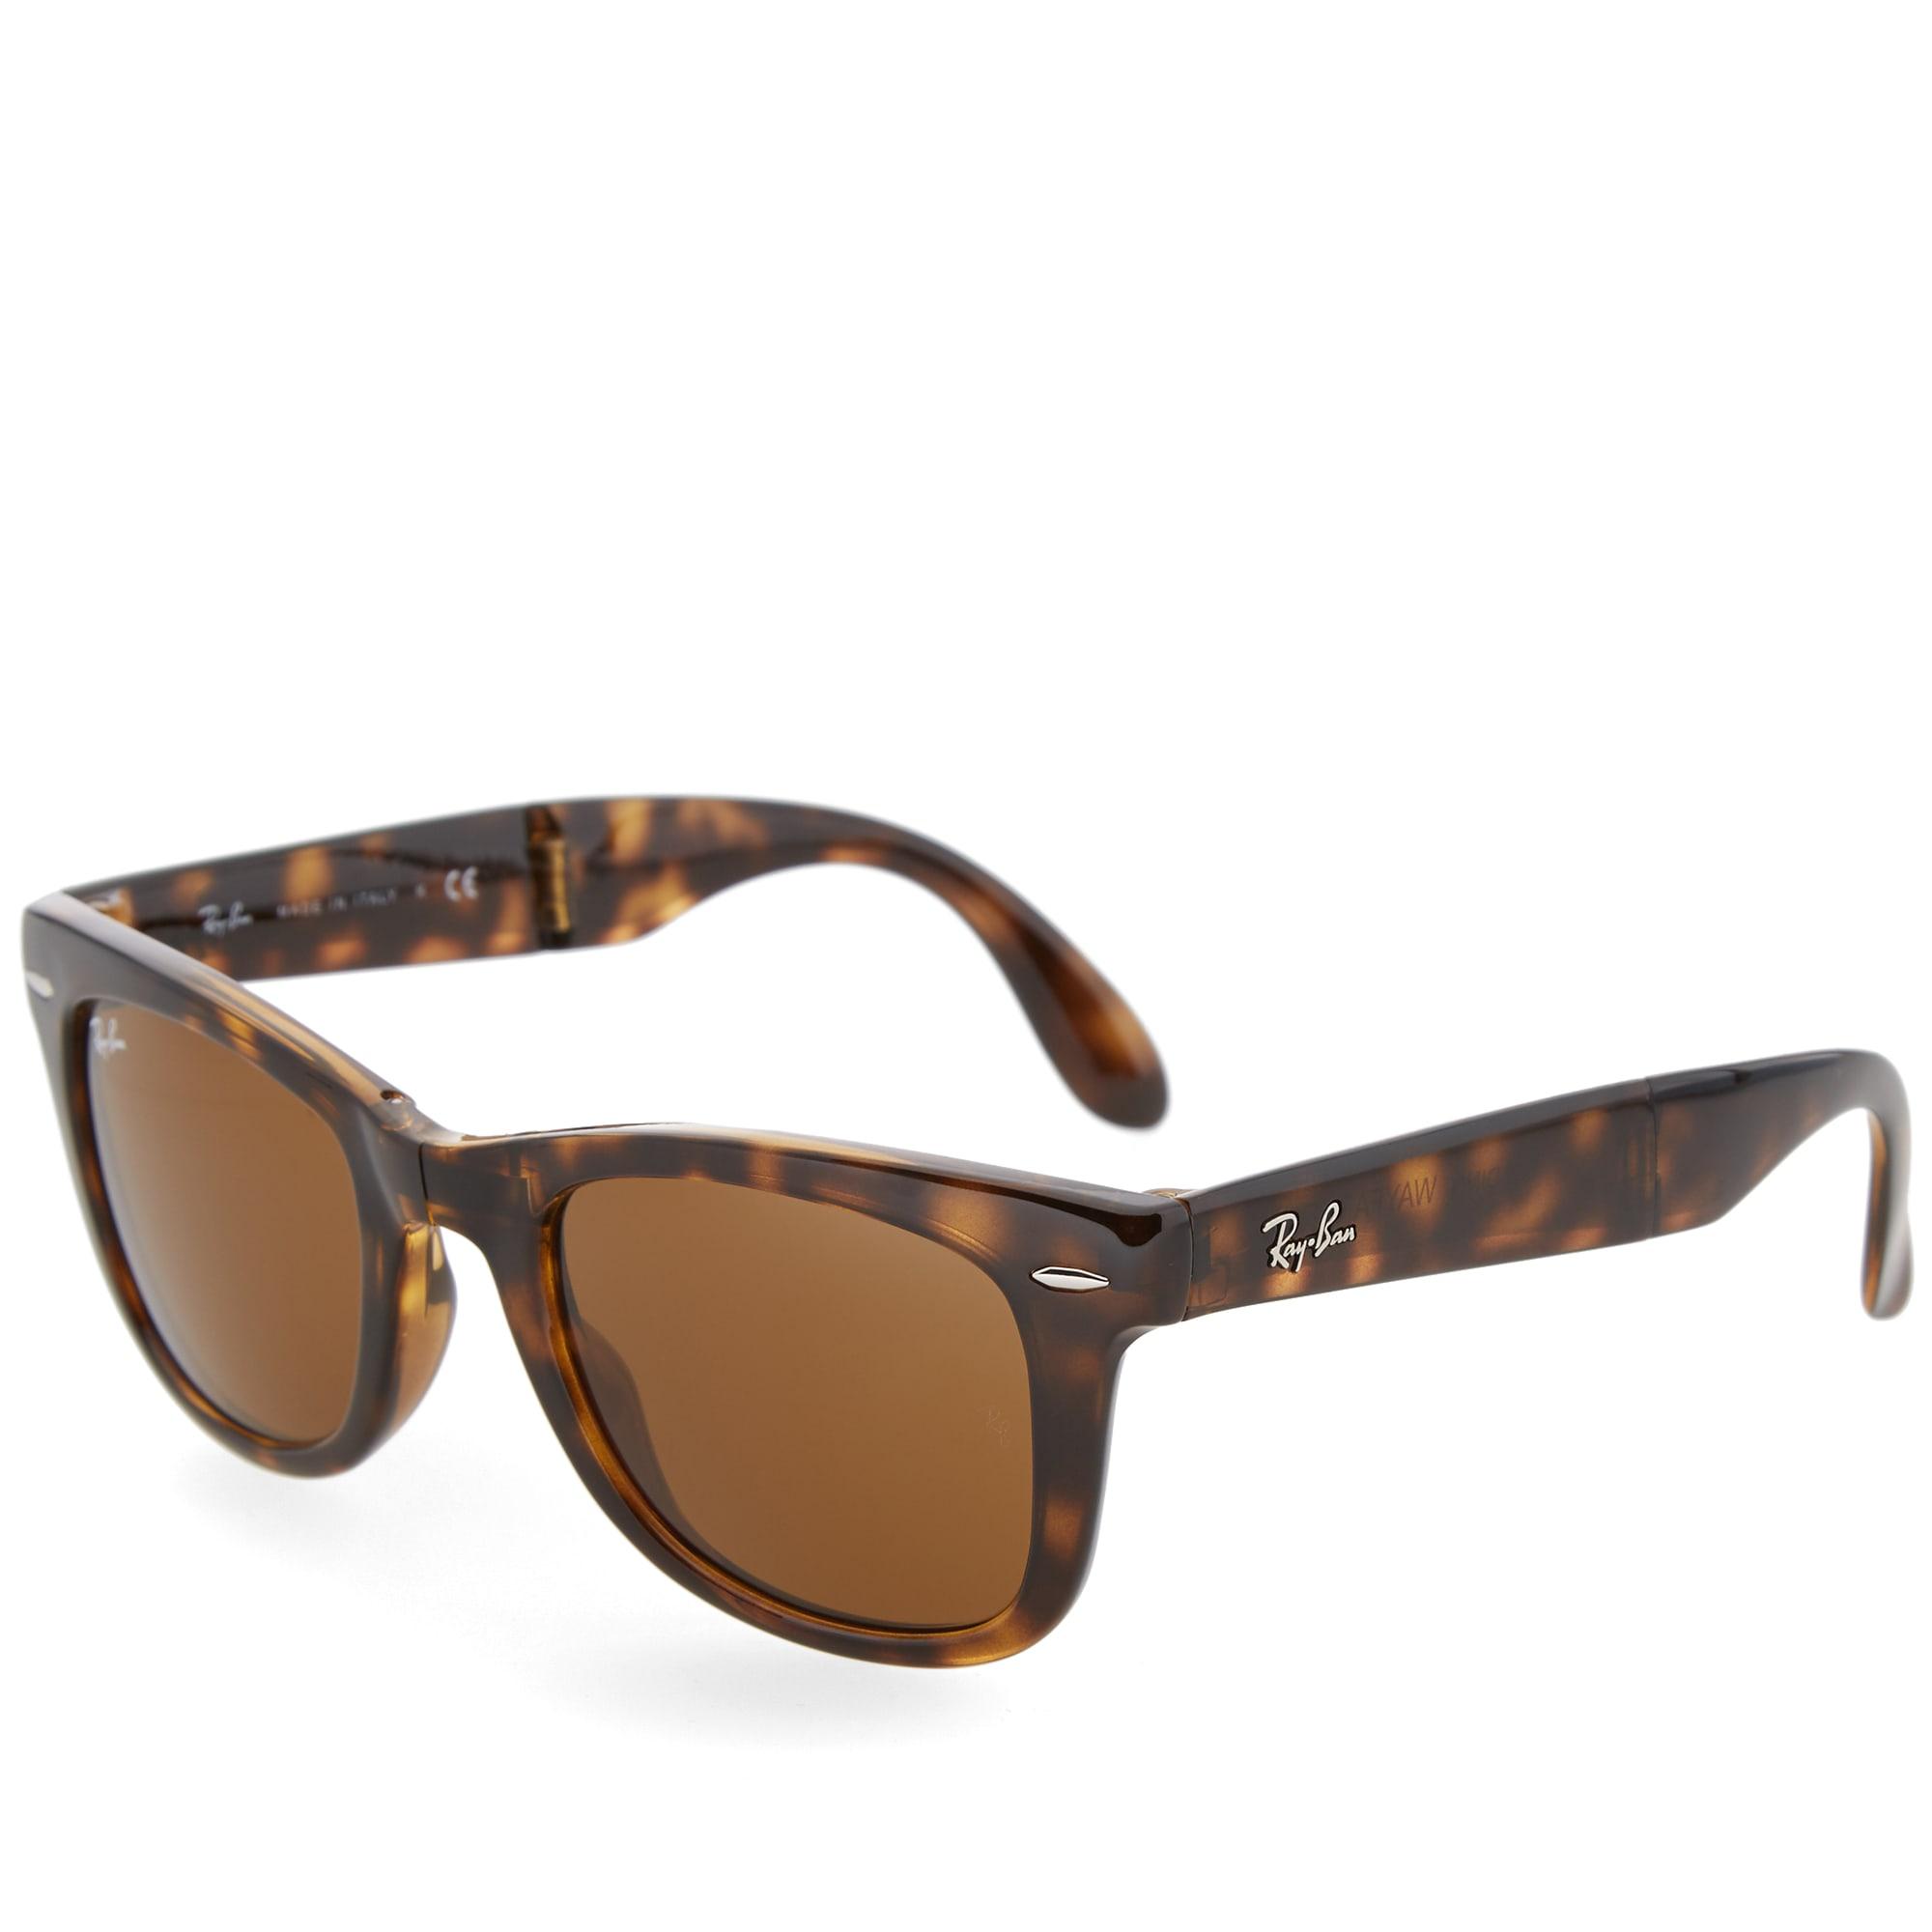 4693a696a6 Ray Ban Wayfarer Folding Sunglasses Light Havana   Brown